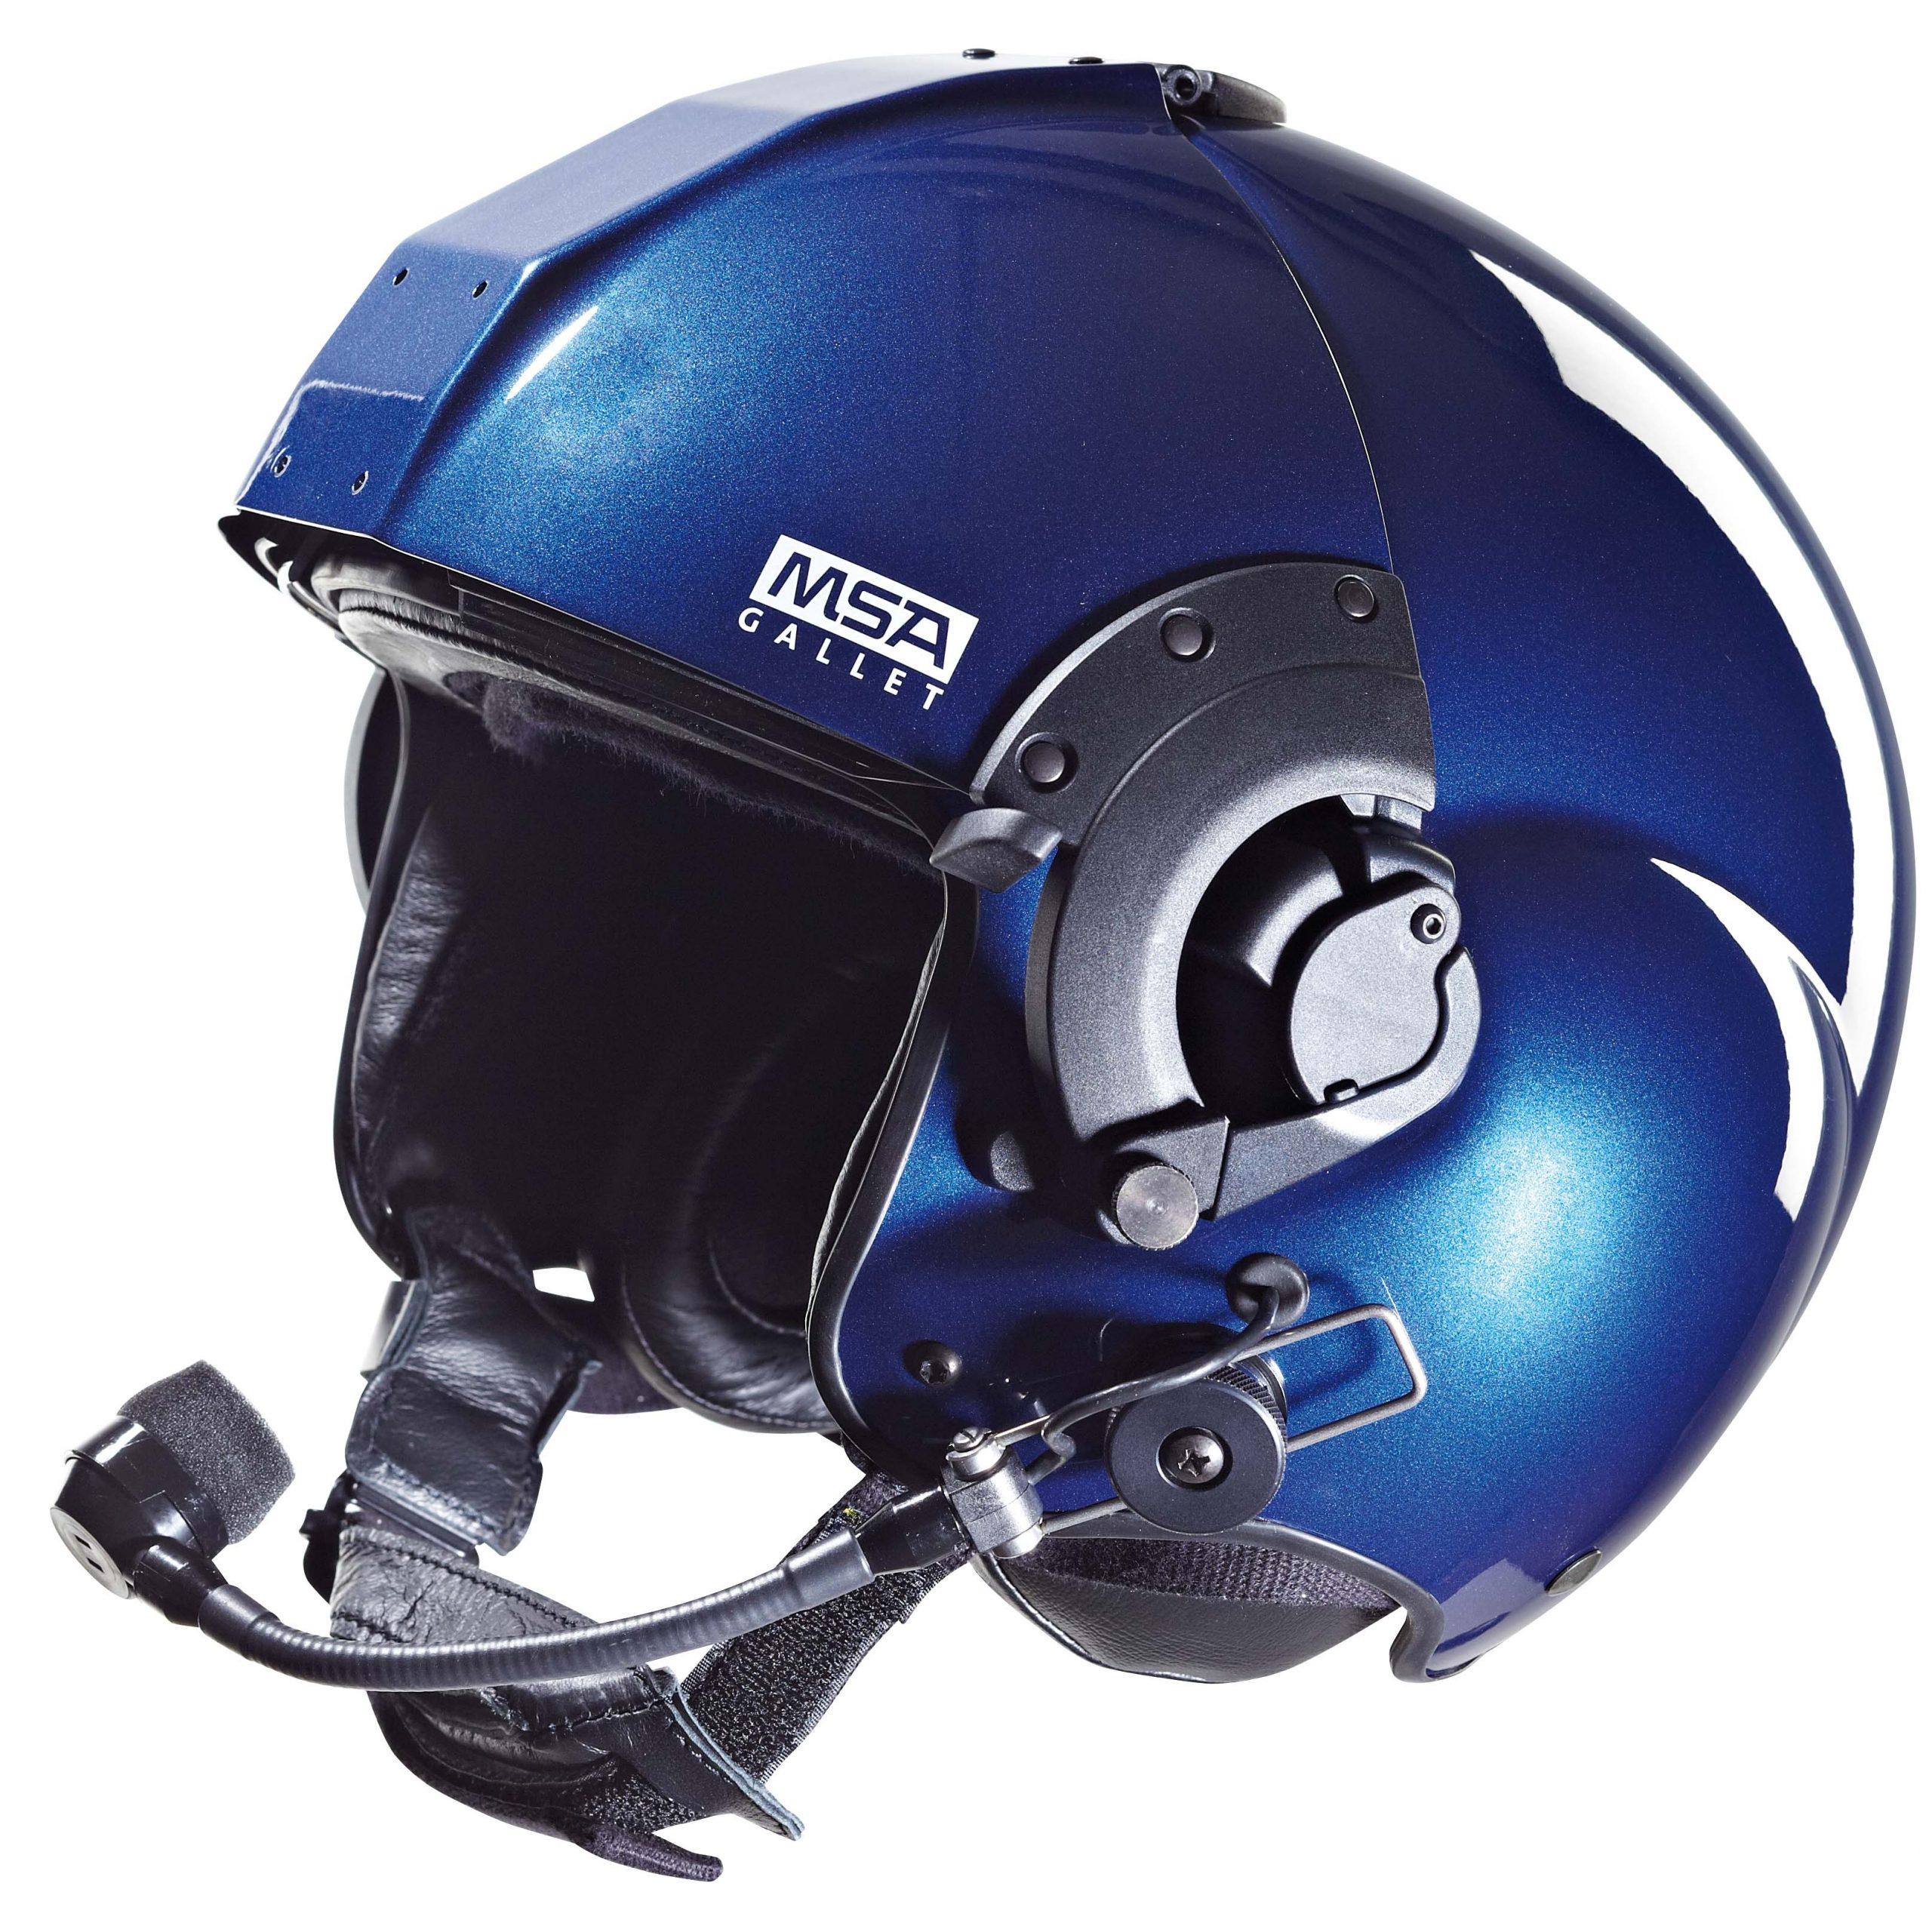 LH350_Gallet helmet